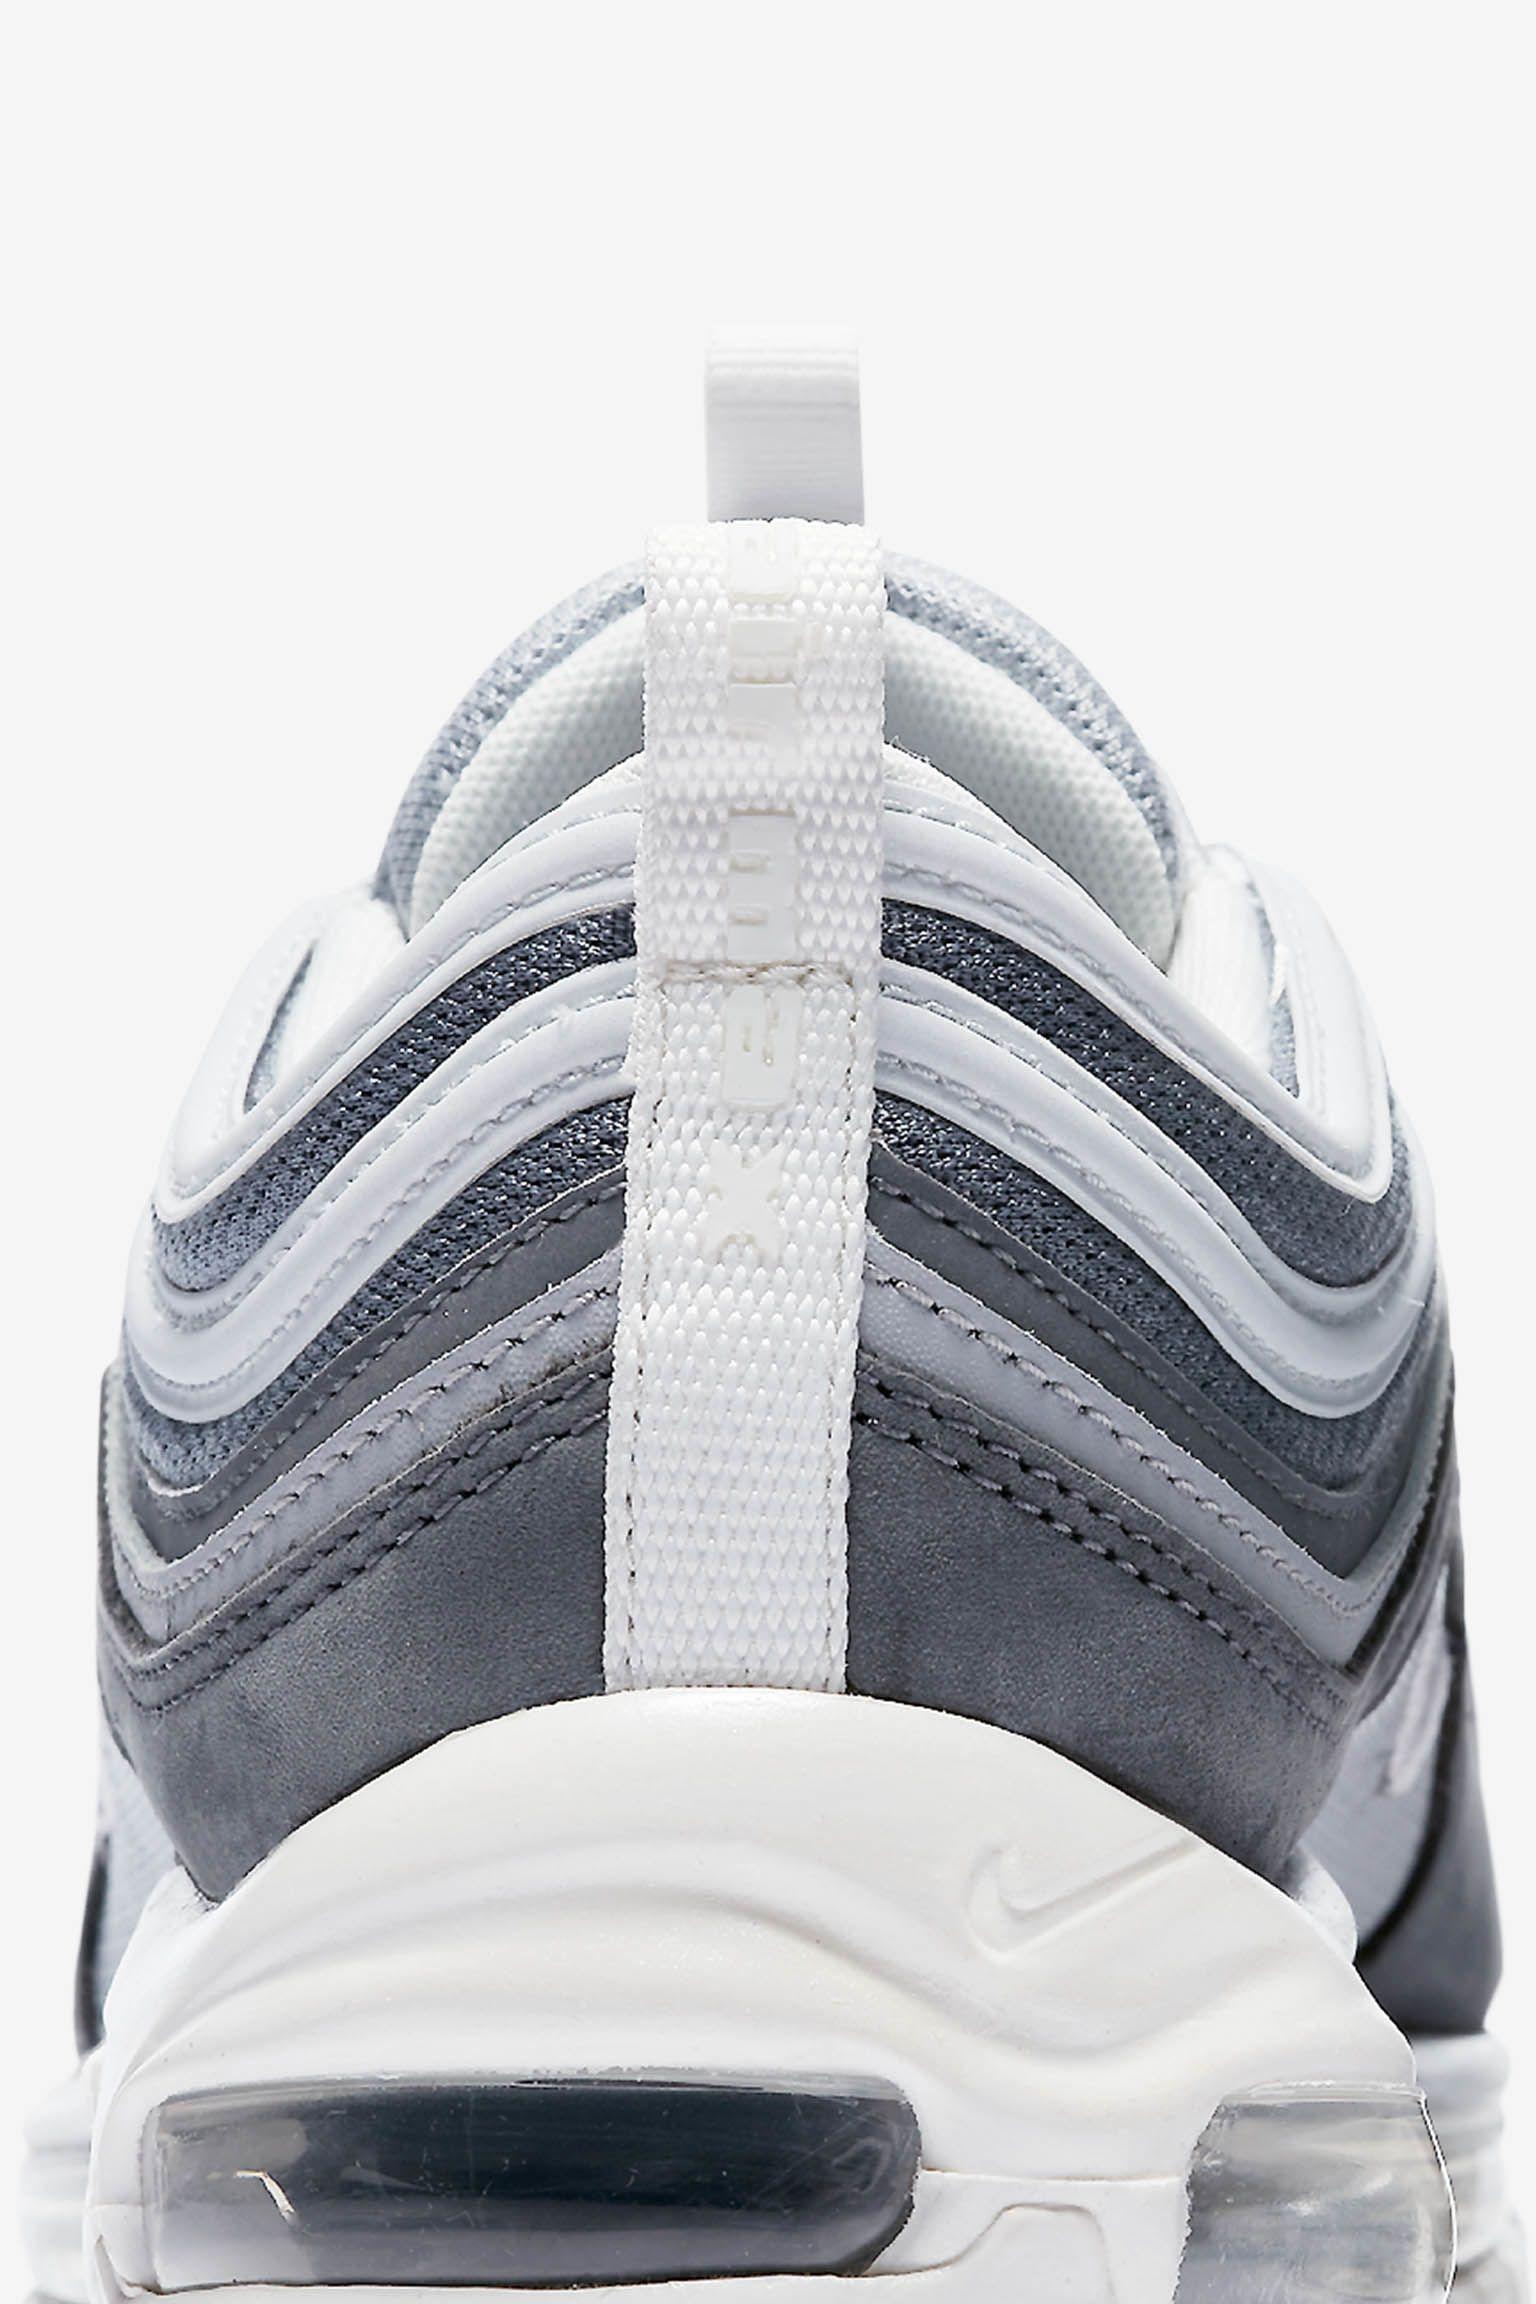 Nike Air Max 97 Premium 'Wolf Grey & Cool Grey' Release Date. Nike ...